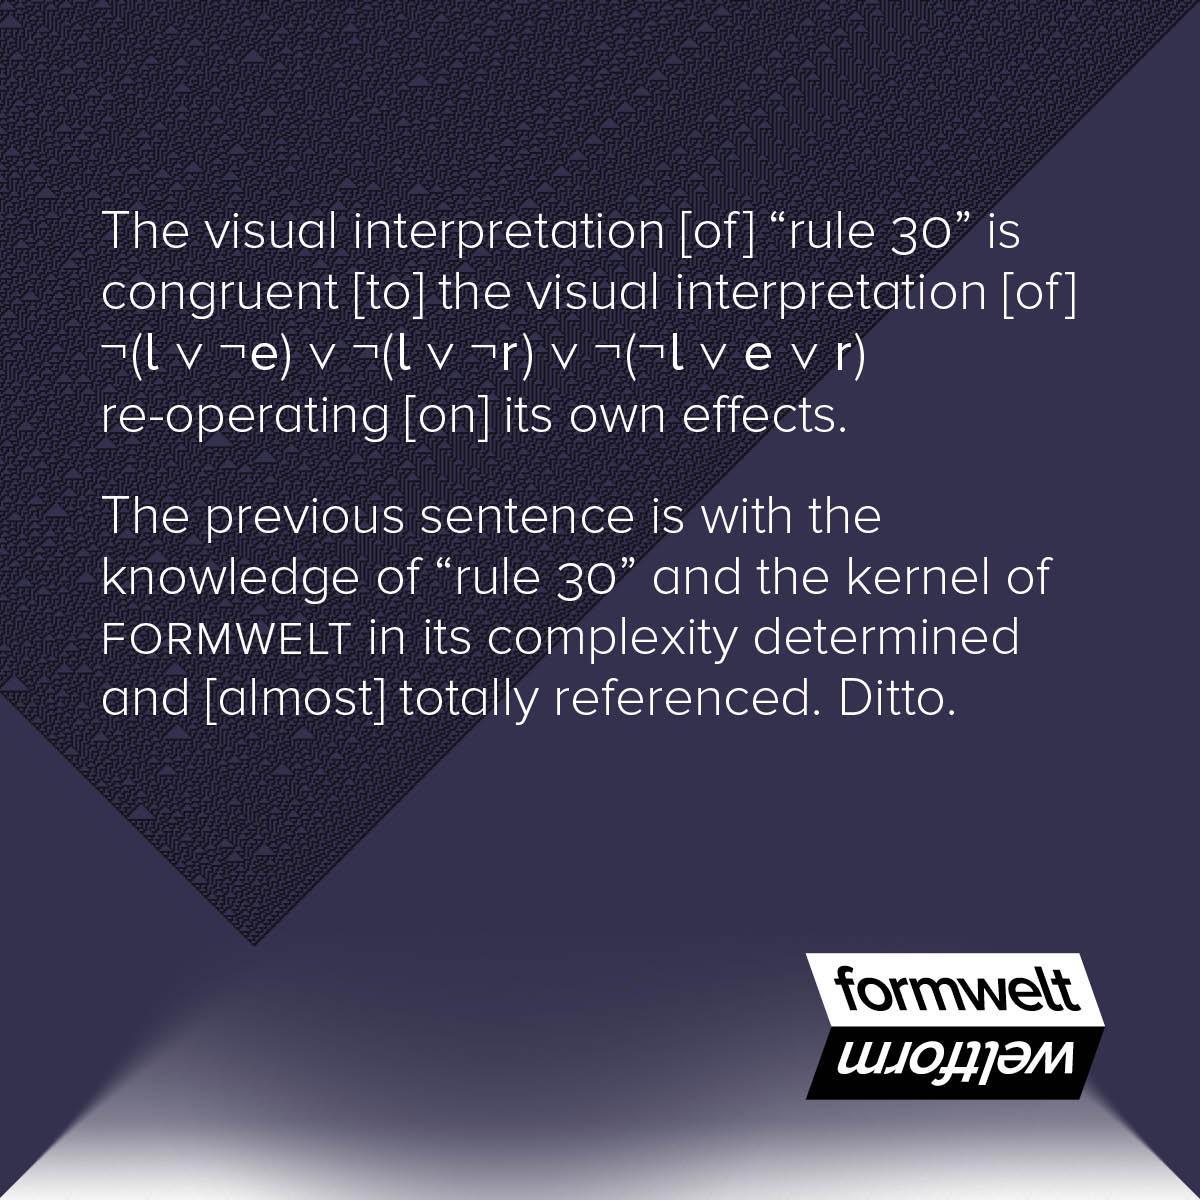 formwelt-Meme_Rule30